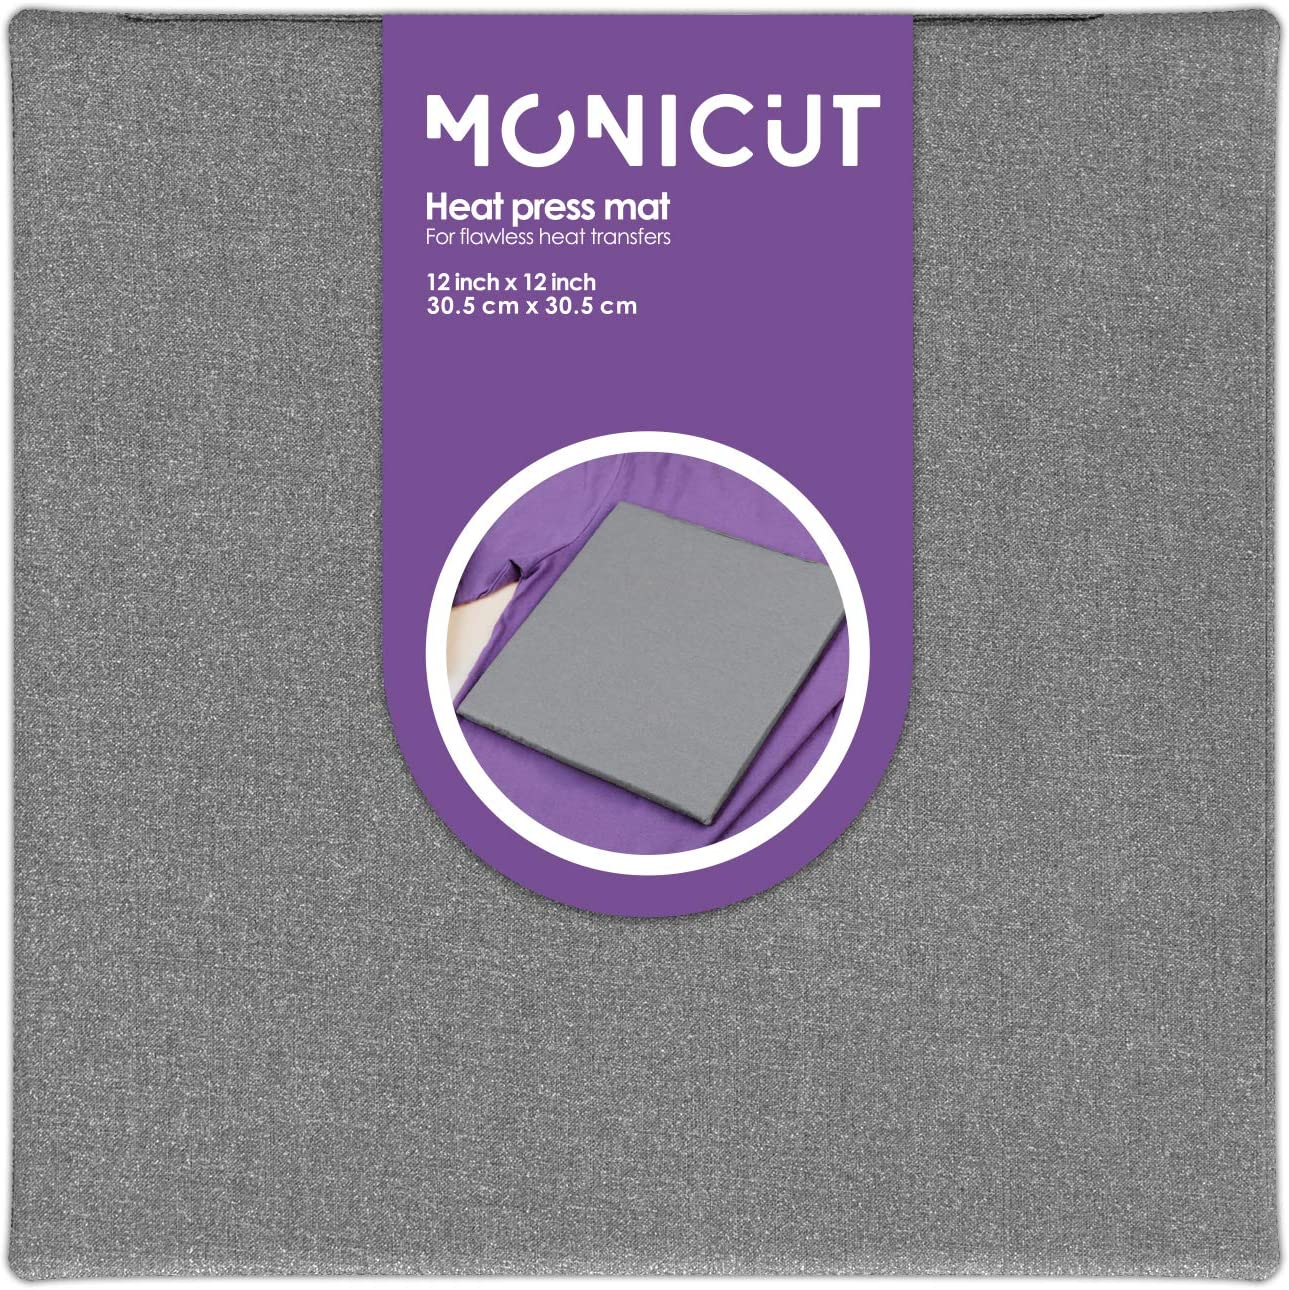 13x13, Geometric Pinson Heat Press Mat Protective Heat-Resistant Mat for Cricut EasyPress